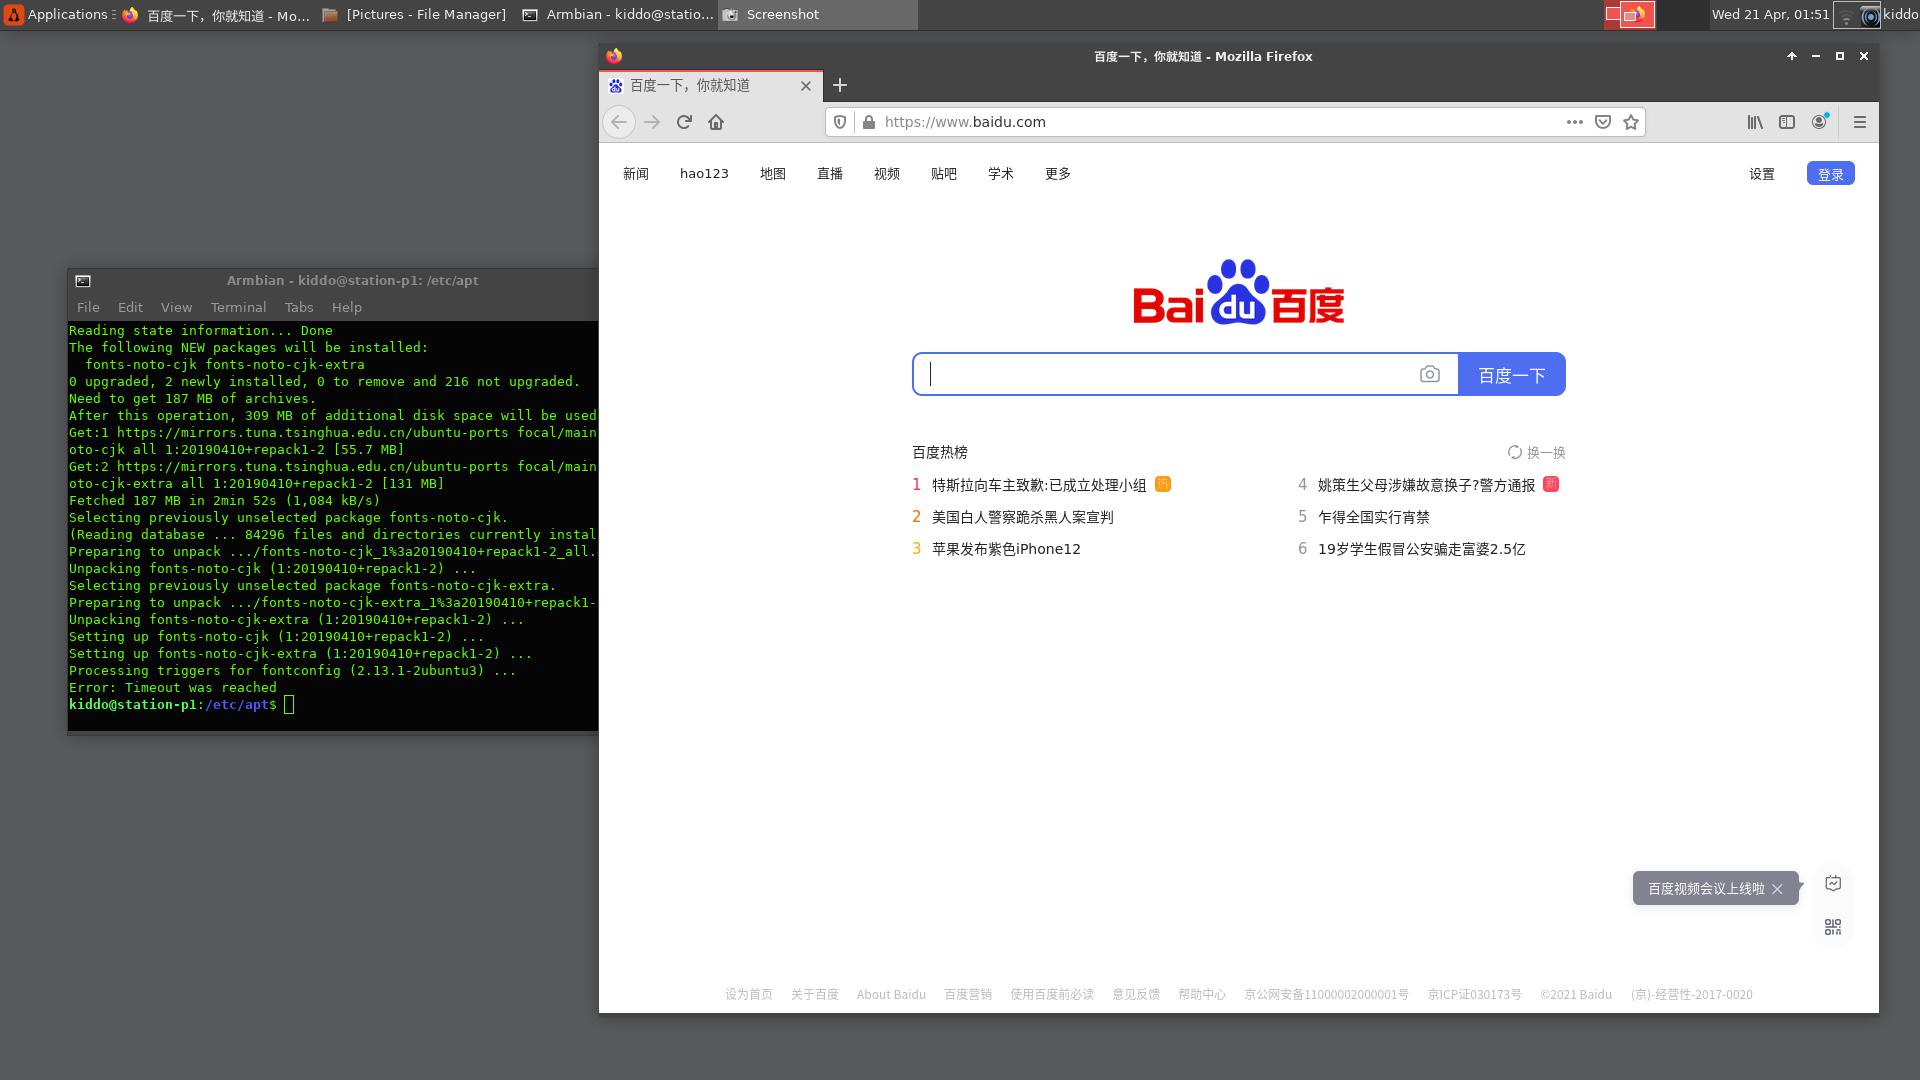 Screenshot_2021-04-21_01-51-25.png